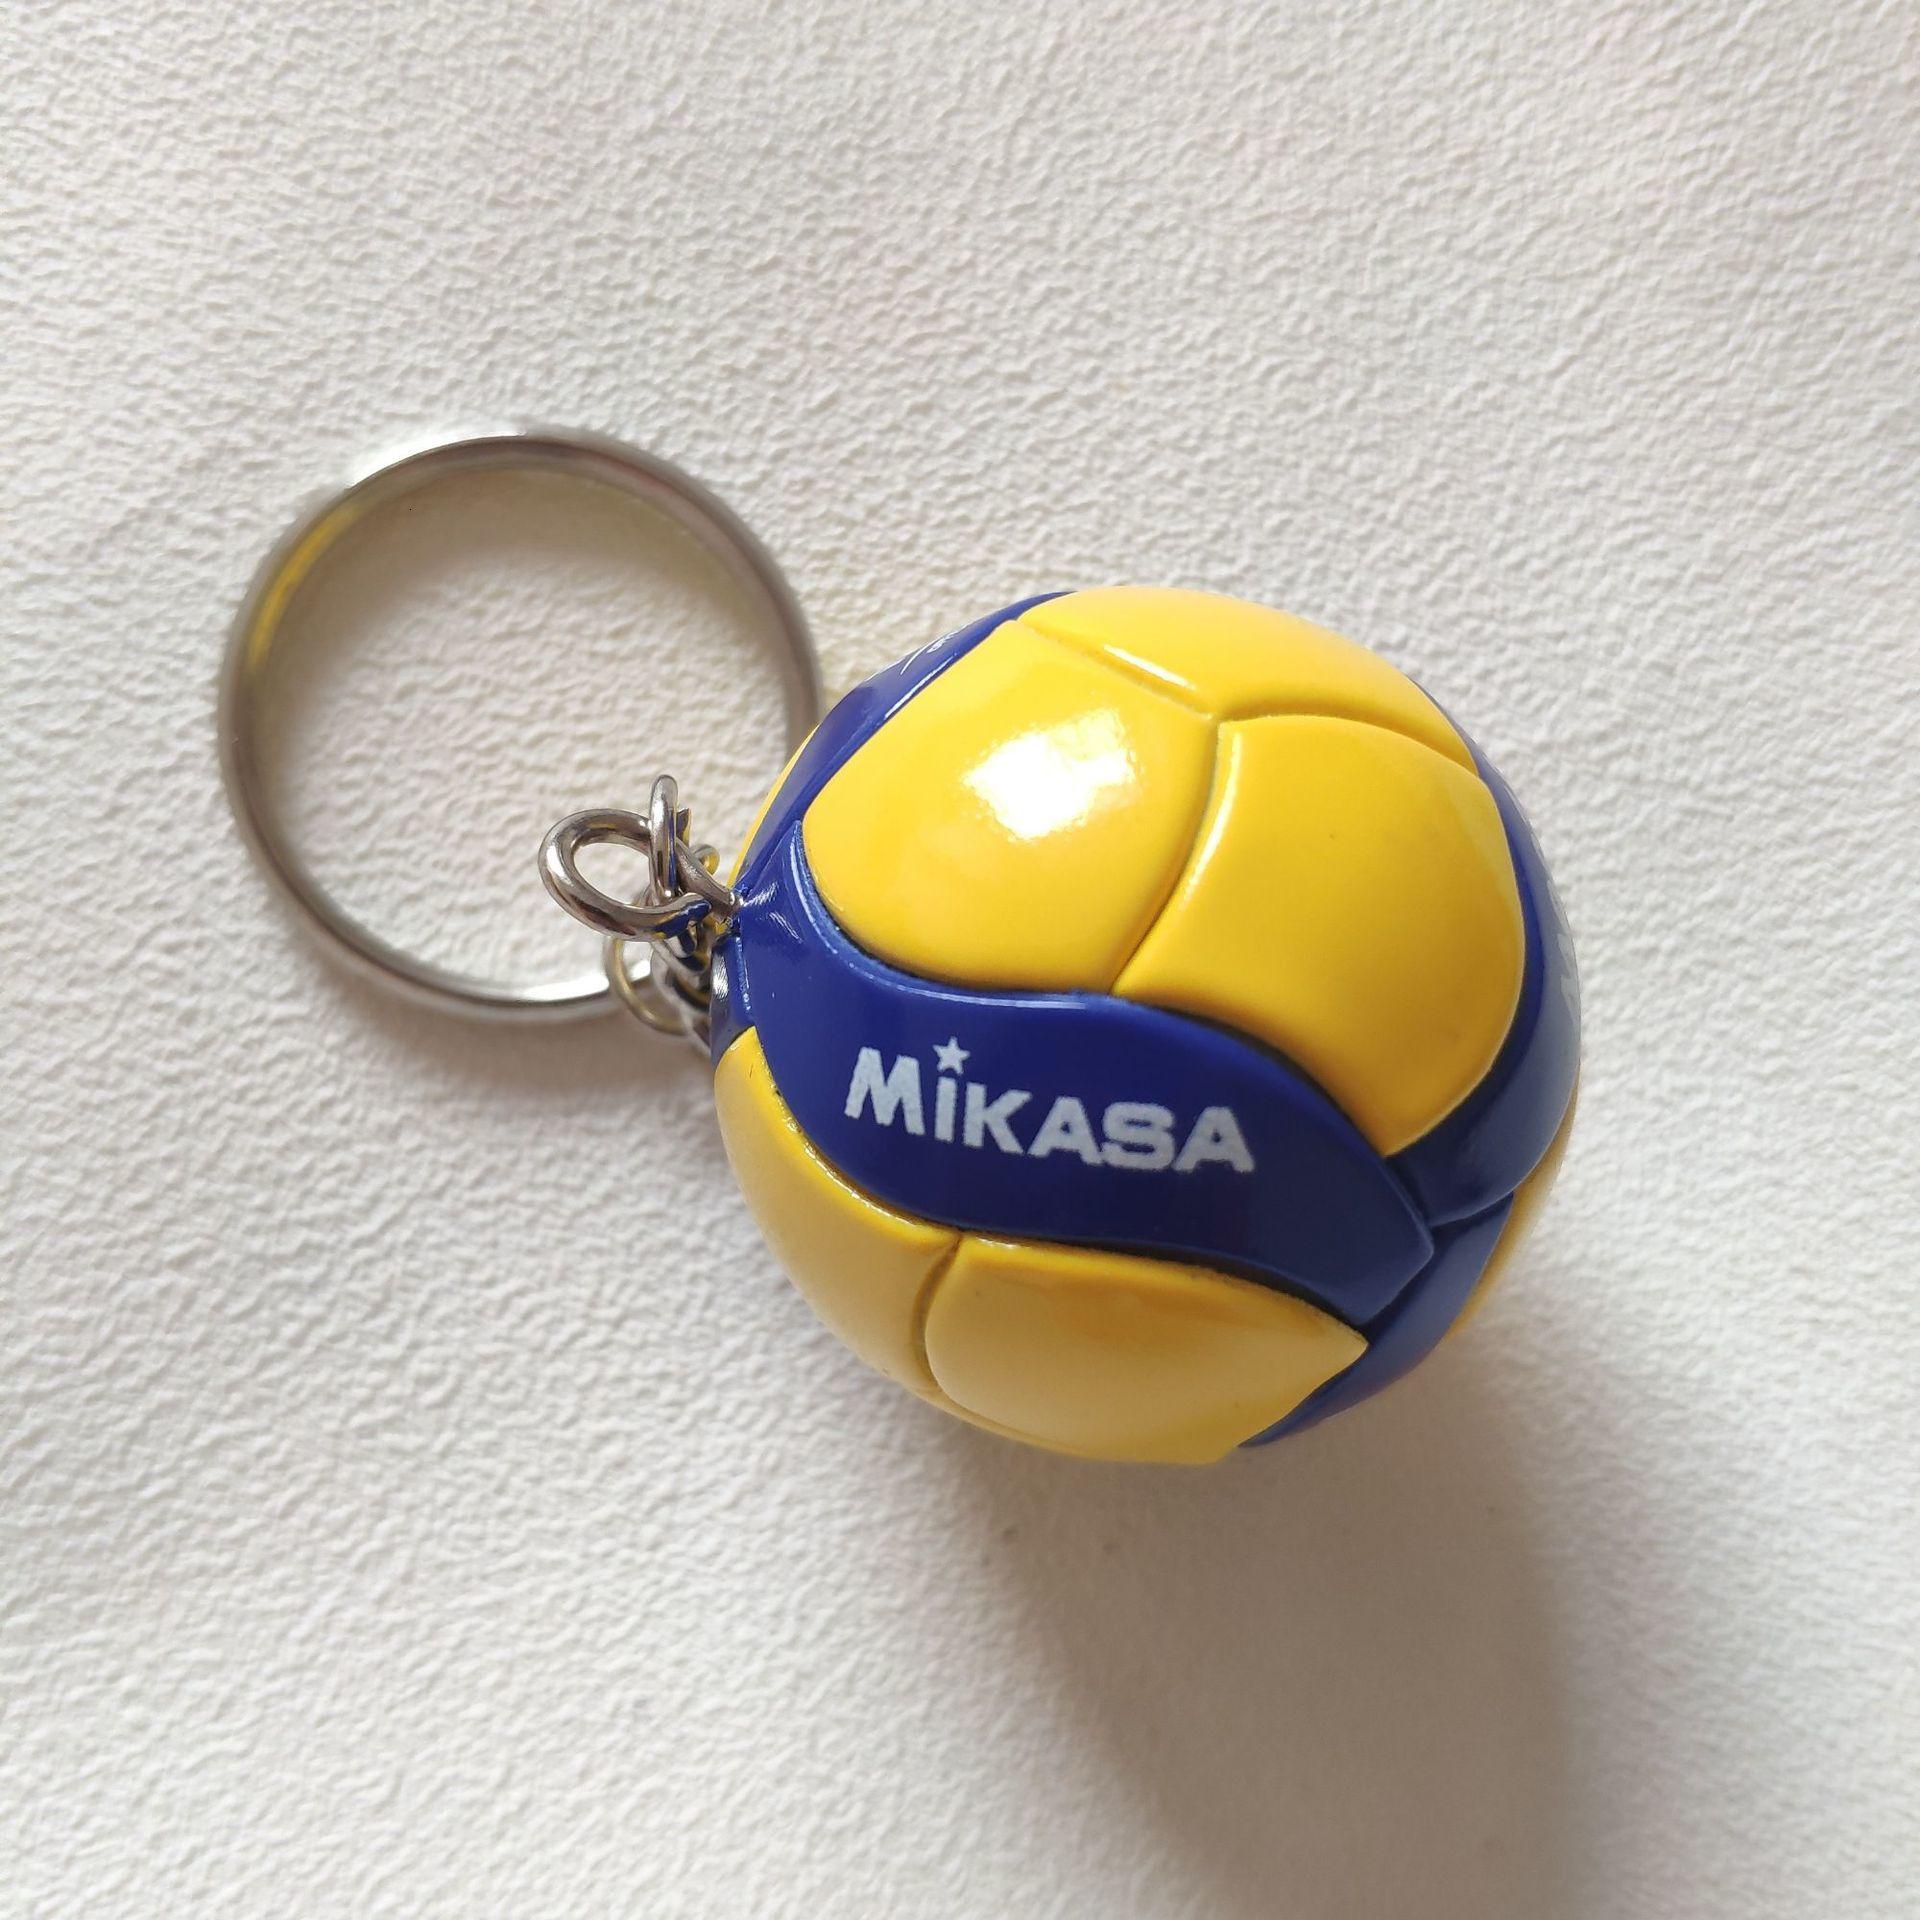 V200w Mini Pvc Volleyball Keychain Sport Key Chain Gift Car Ball Key Holder Ring For Players Men Women Keyring Birthday Gift Key Chains Aliexpress